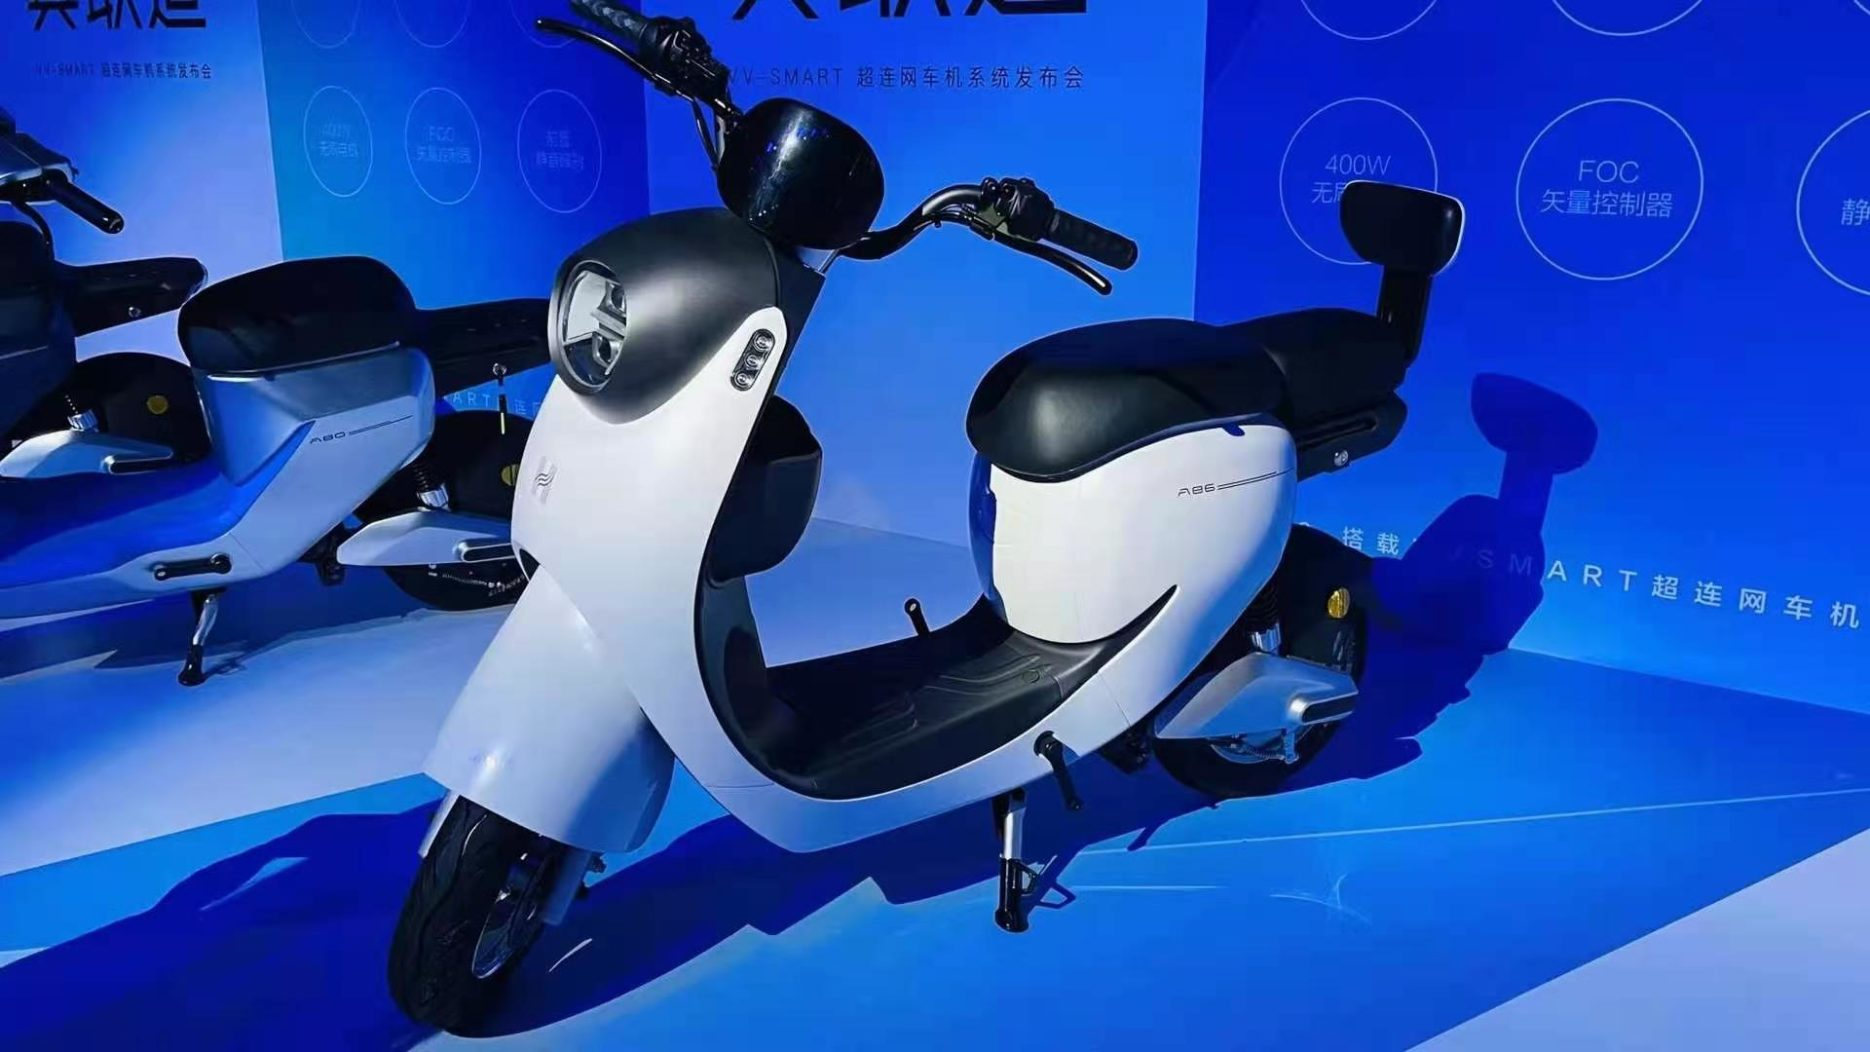 Hellobike's new electric vehicles Credit: Hellobike